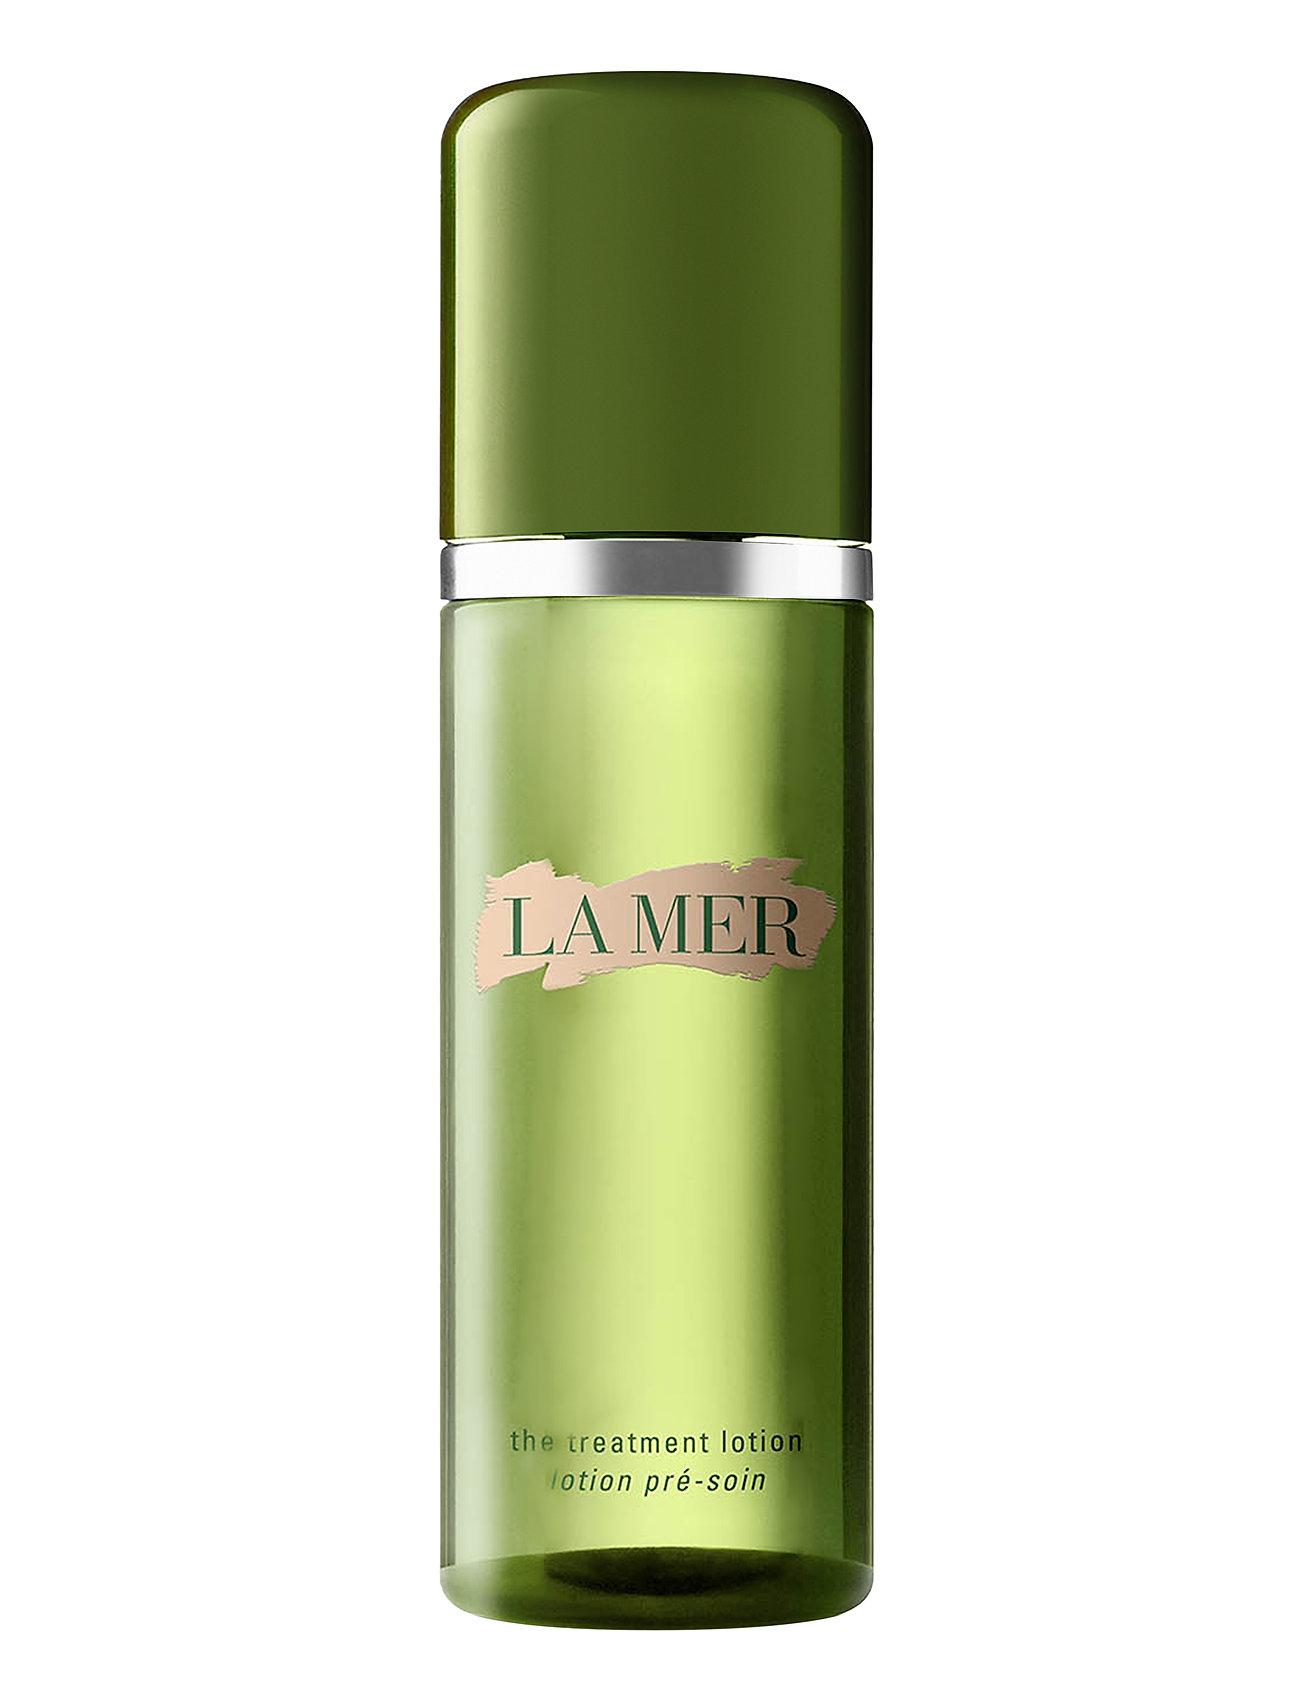 La Mer The Treatment Lotion - CLEAR